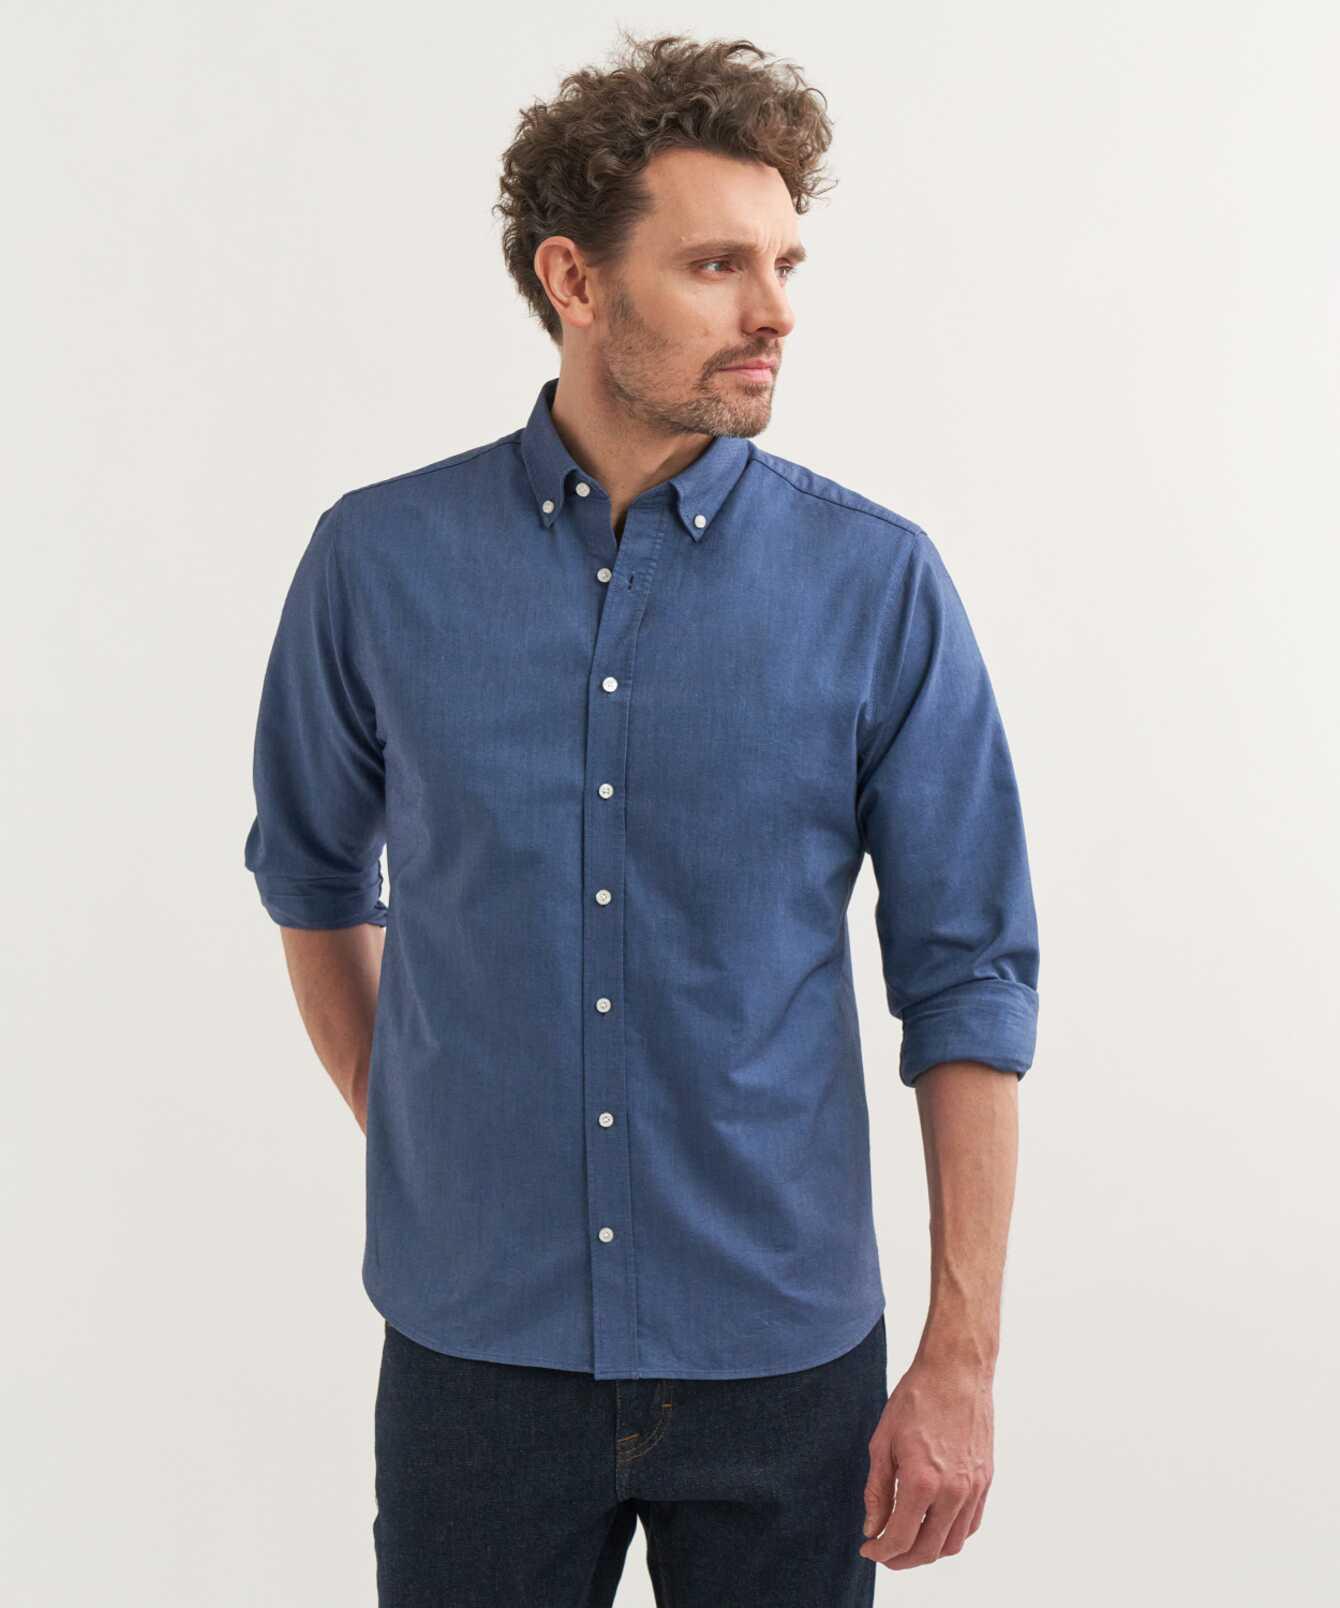 Skjorta Boston Oxford Havsblå The Shirt Factory